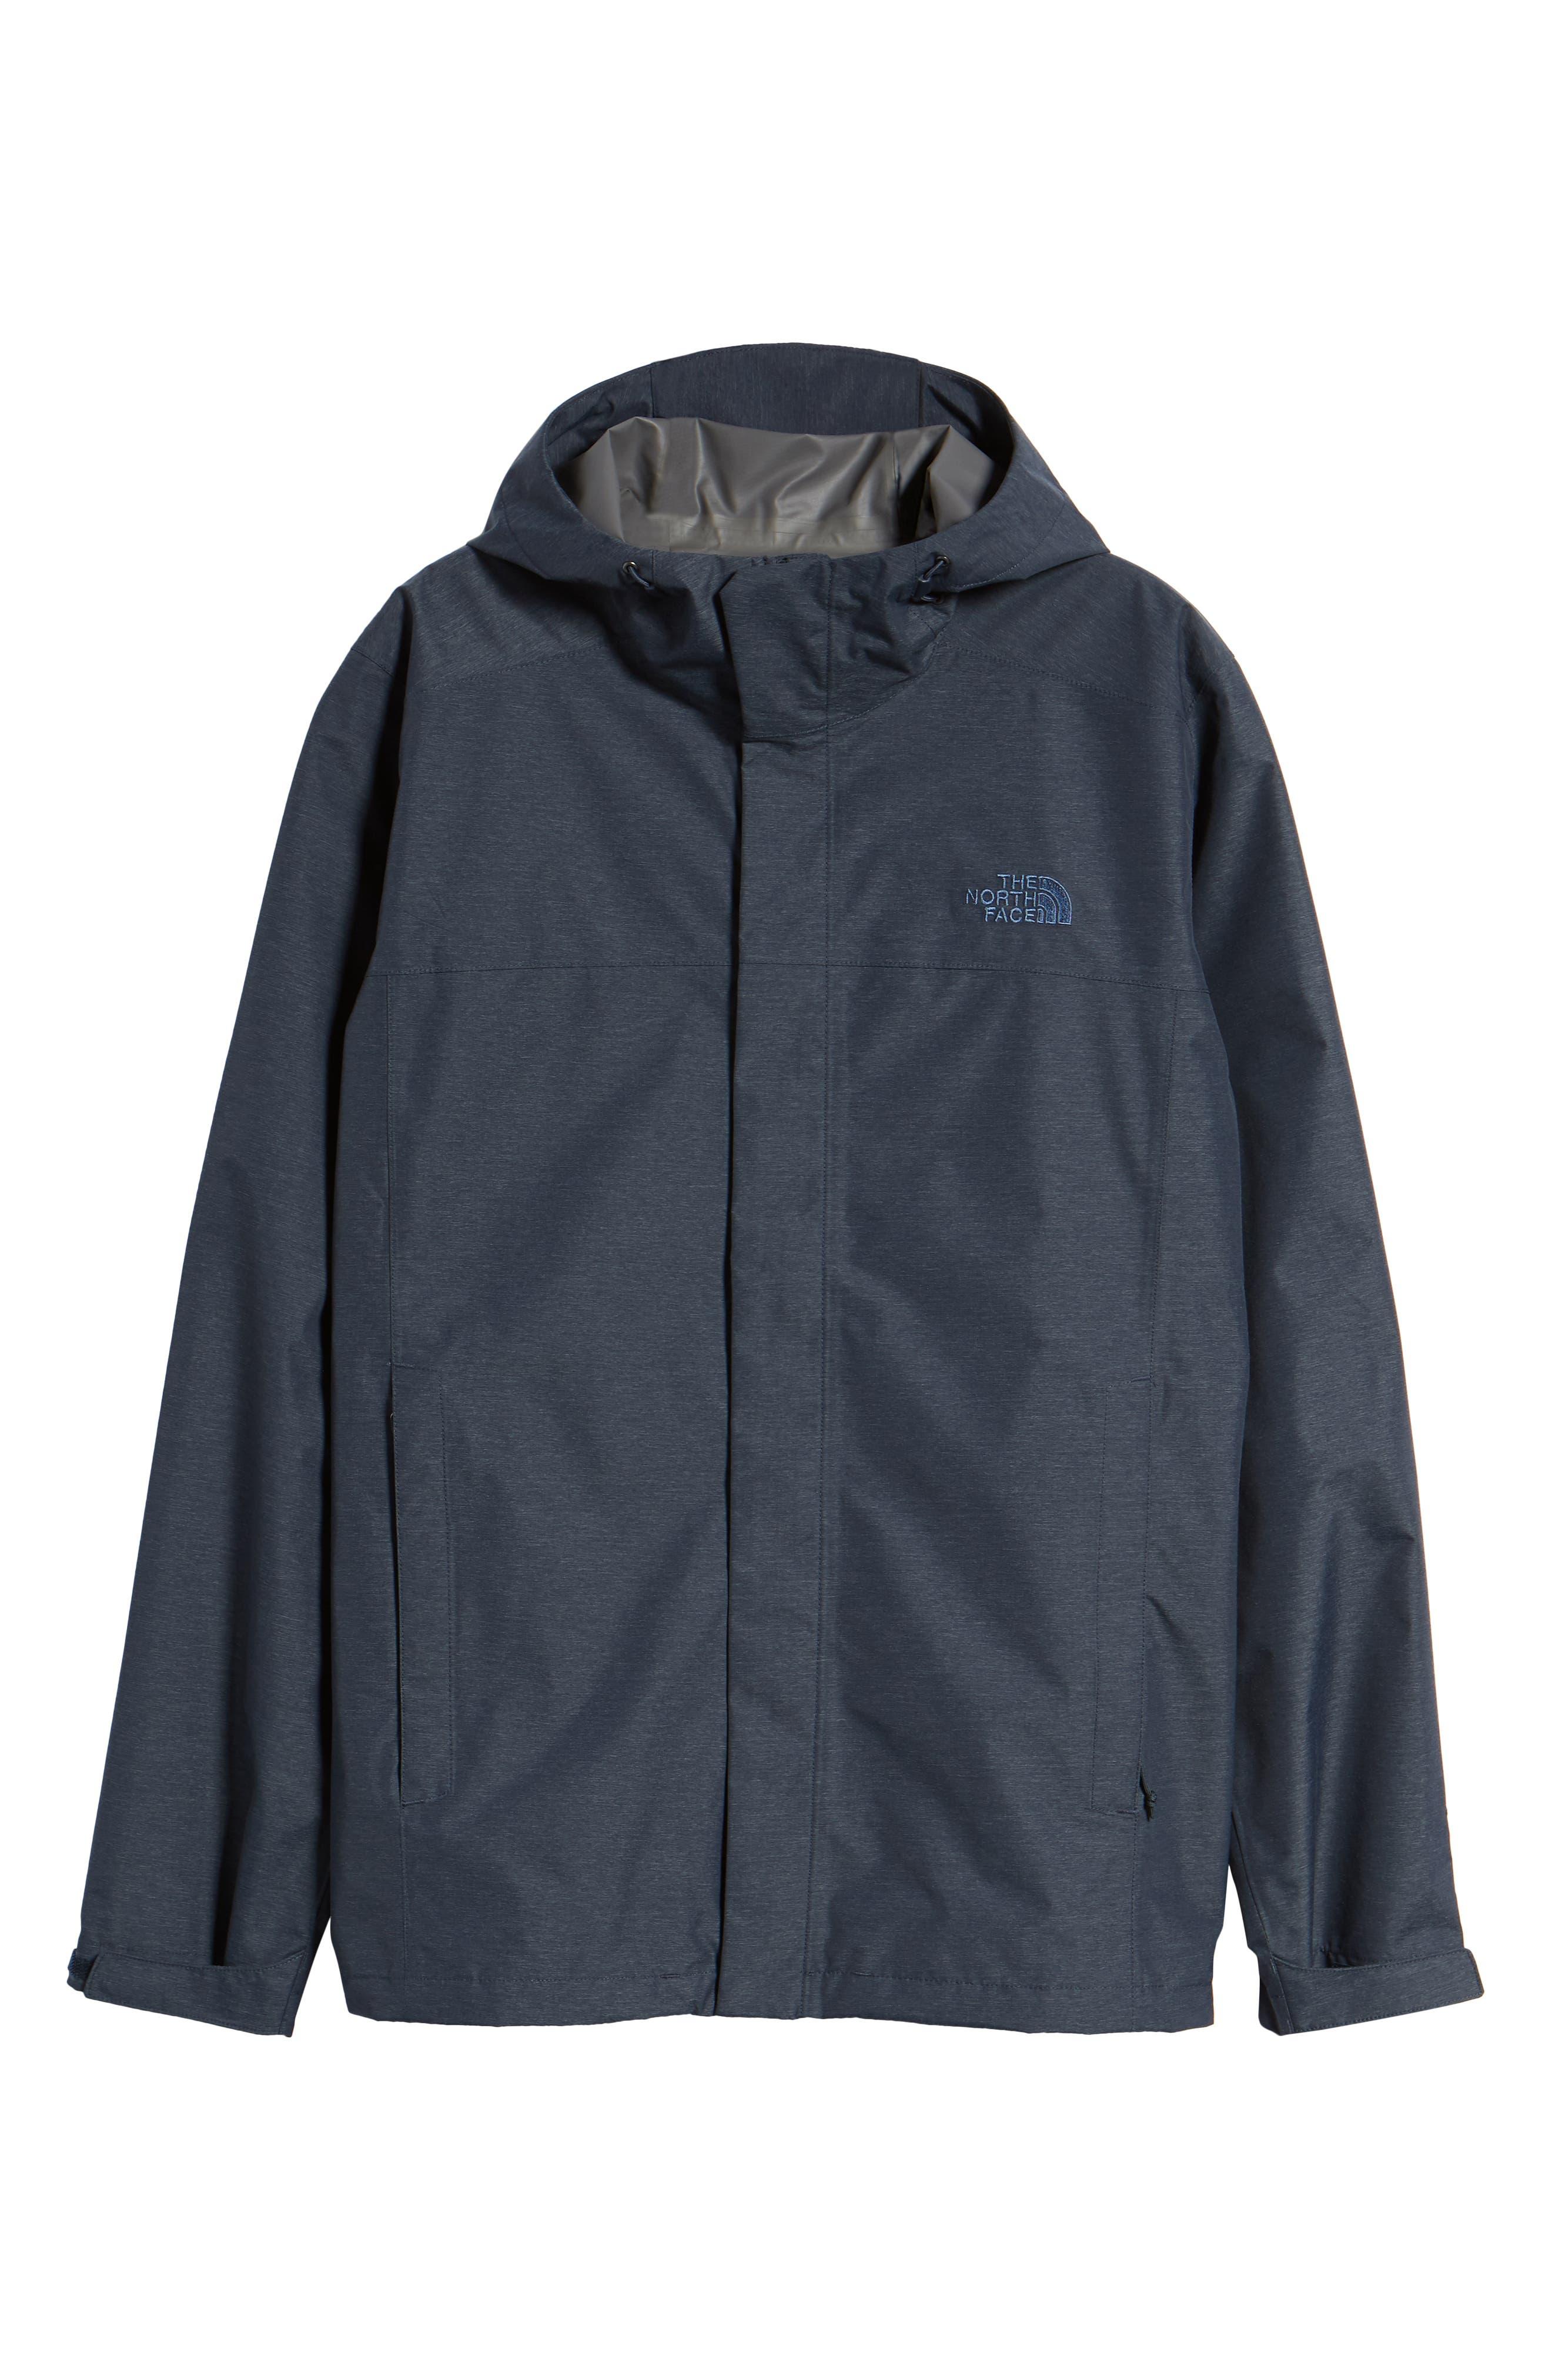 Venture 2 Waterproof Jacket,                             Alternate thumbnail 5, color,                             URBAN NAVY HEATHER